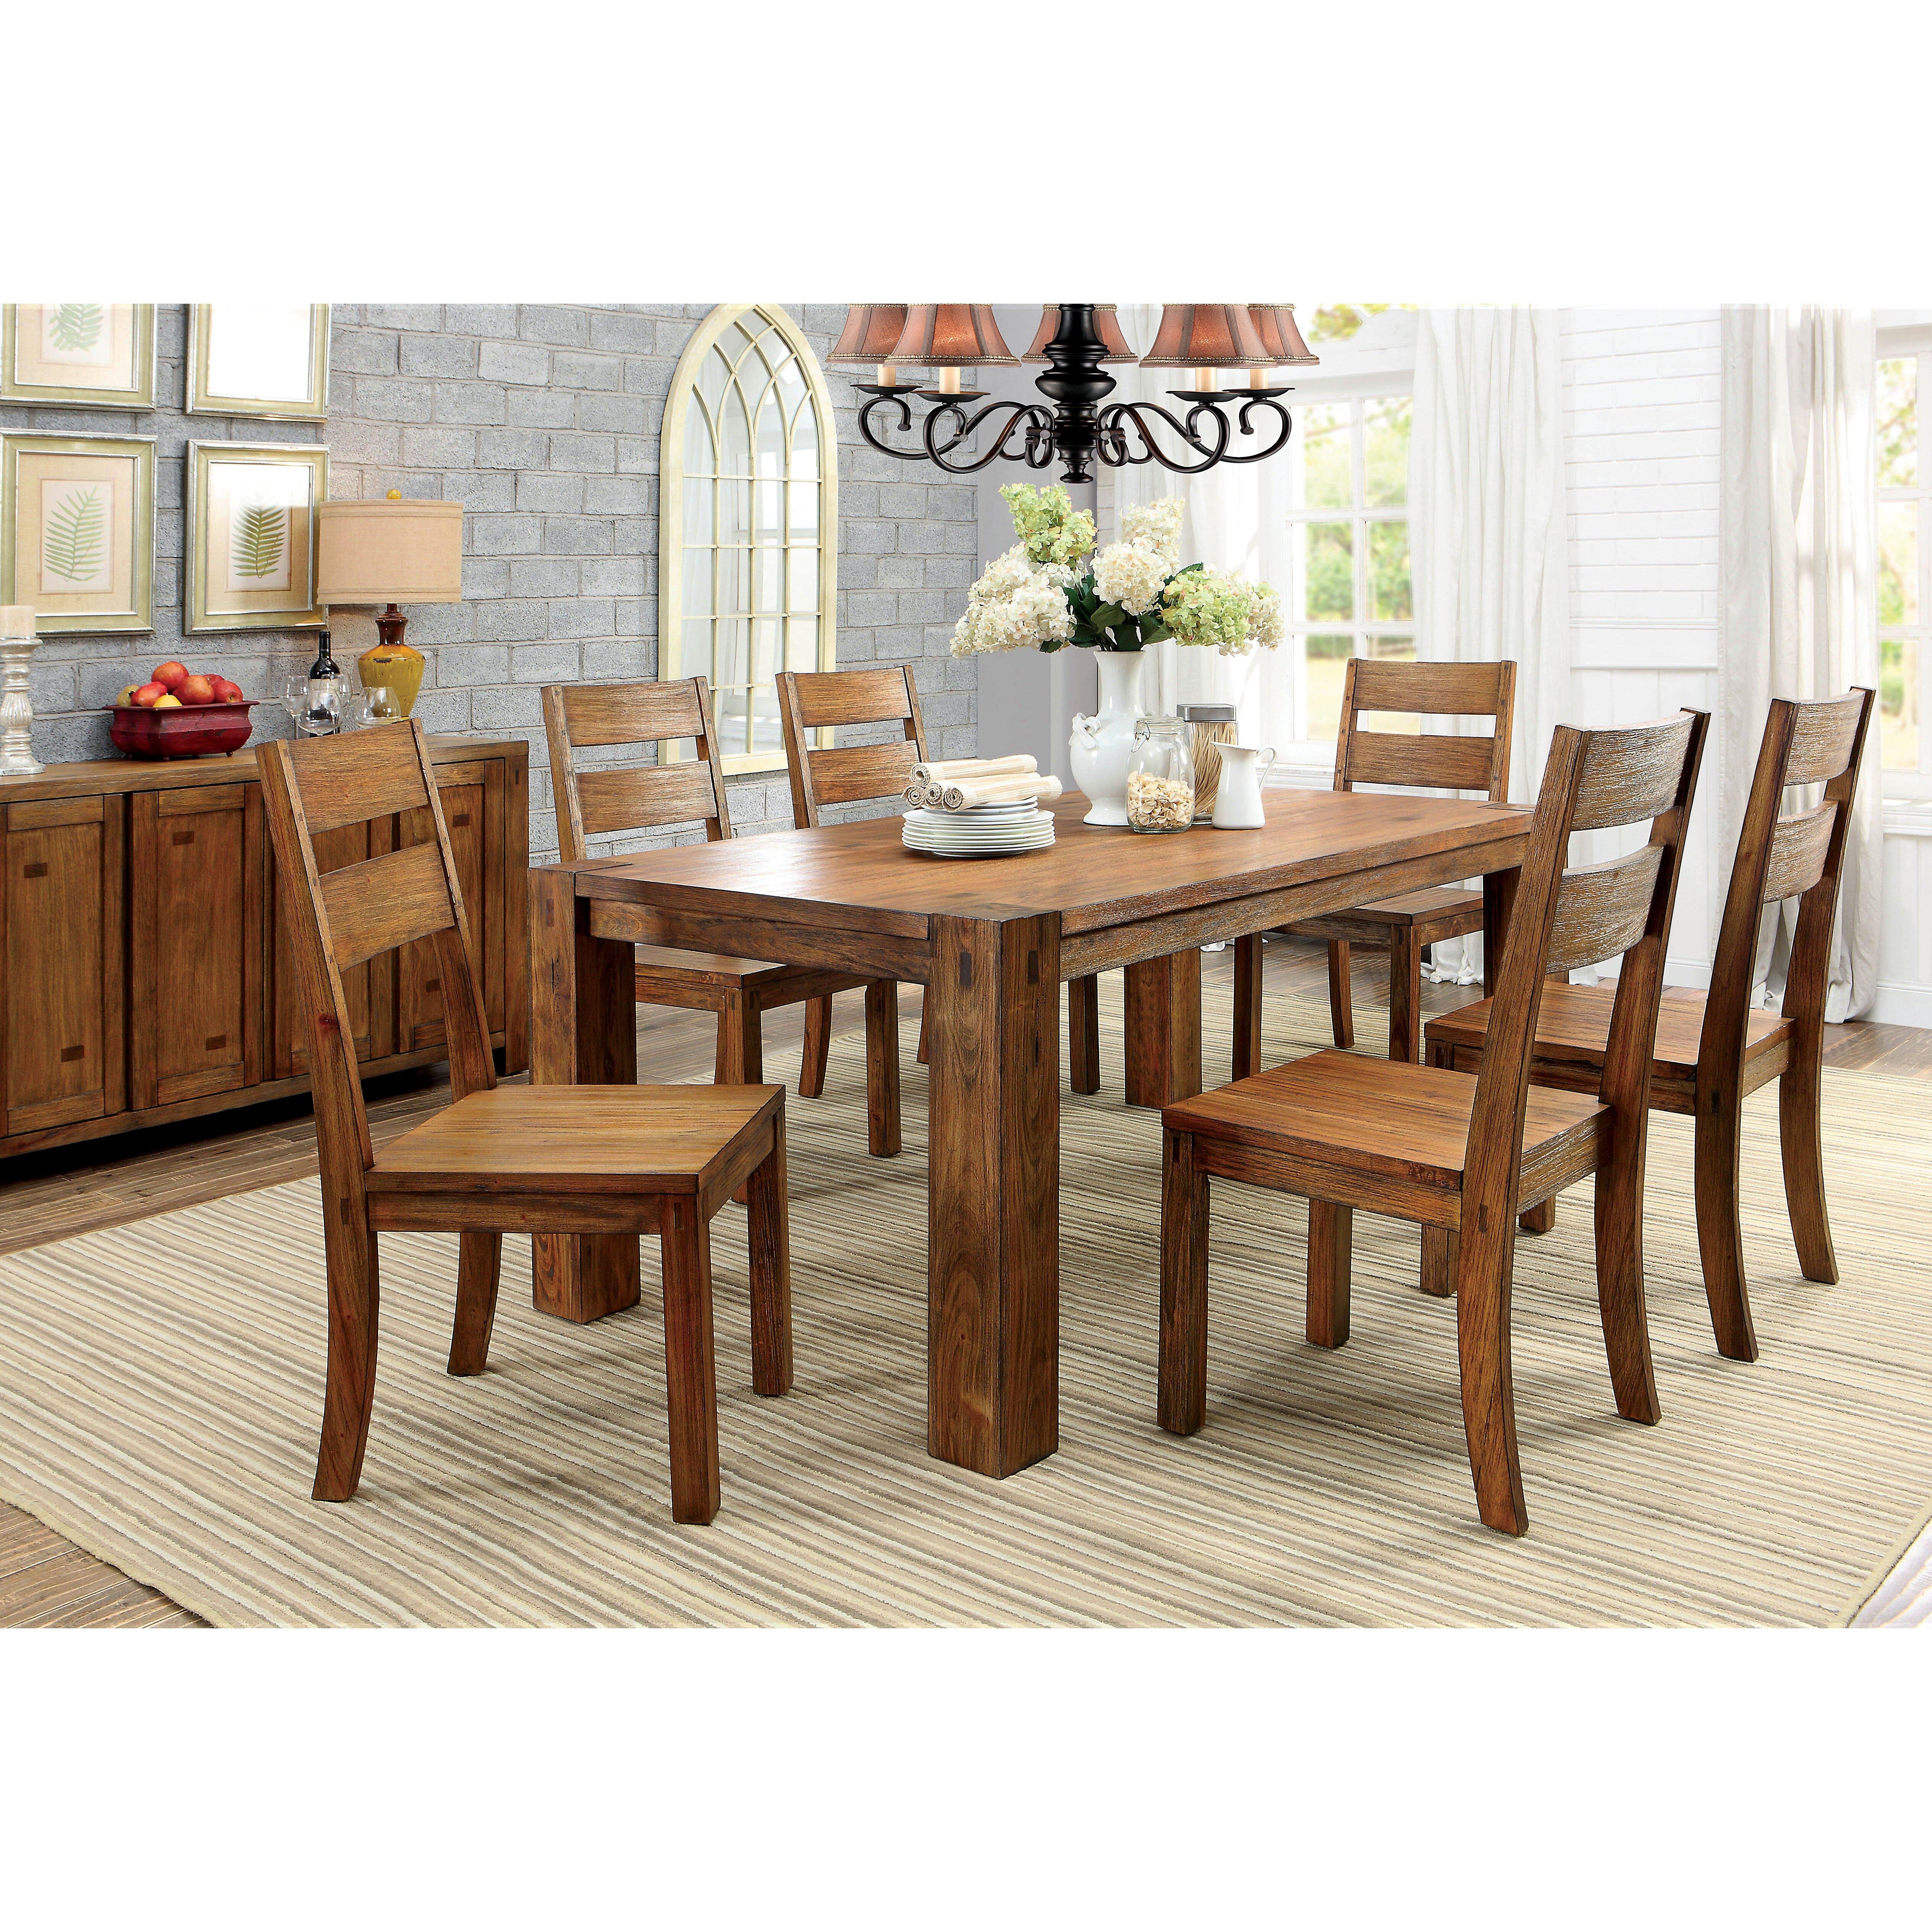 Hokku designs bethanne dining table wayfair for Hokku designs dining room furniture